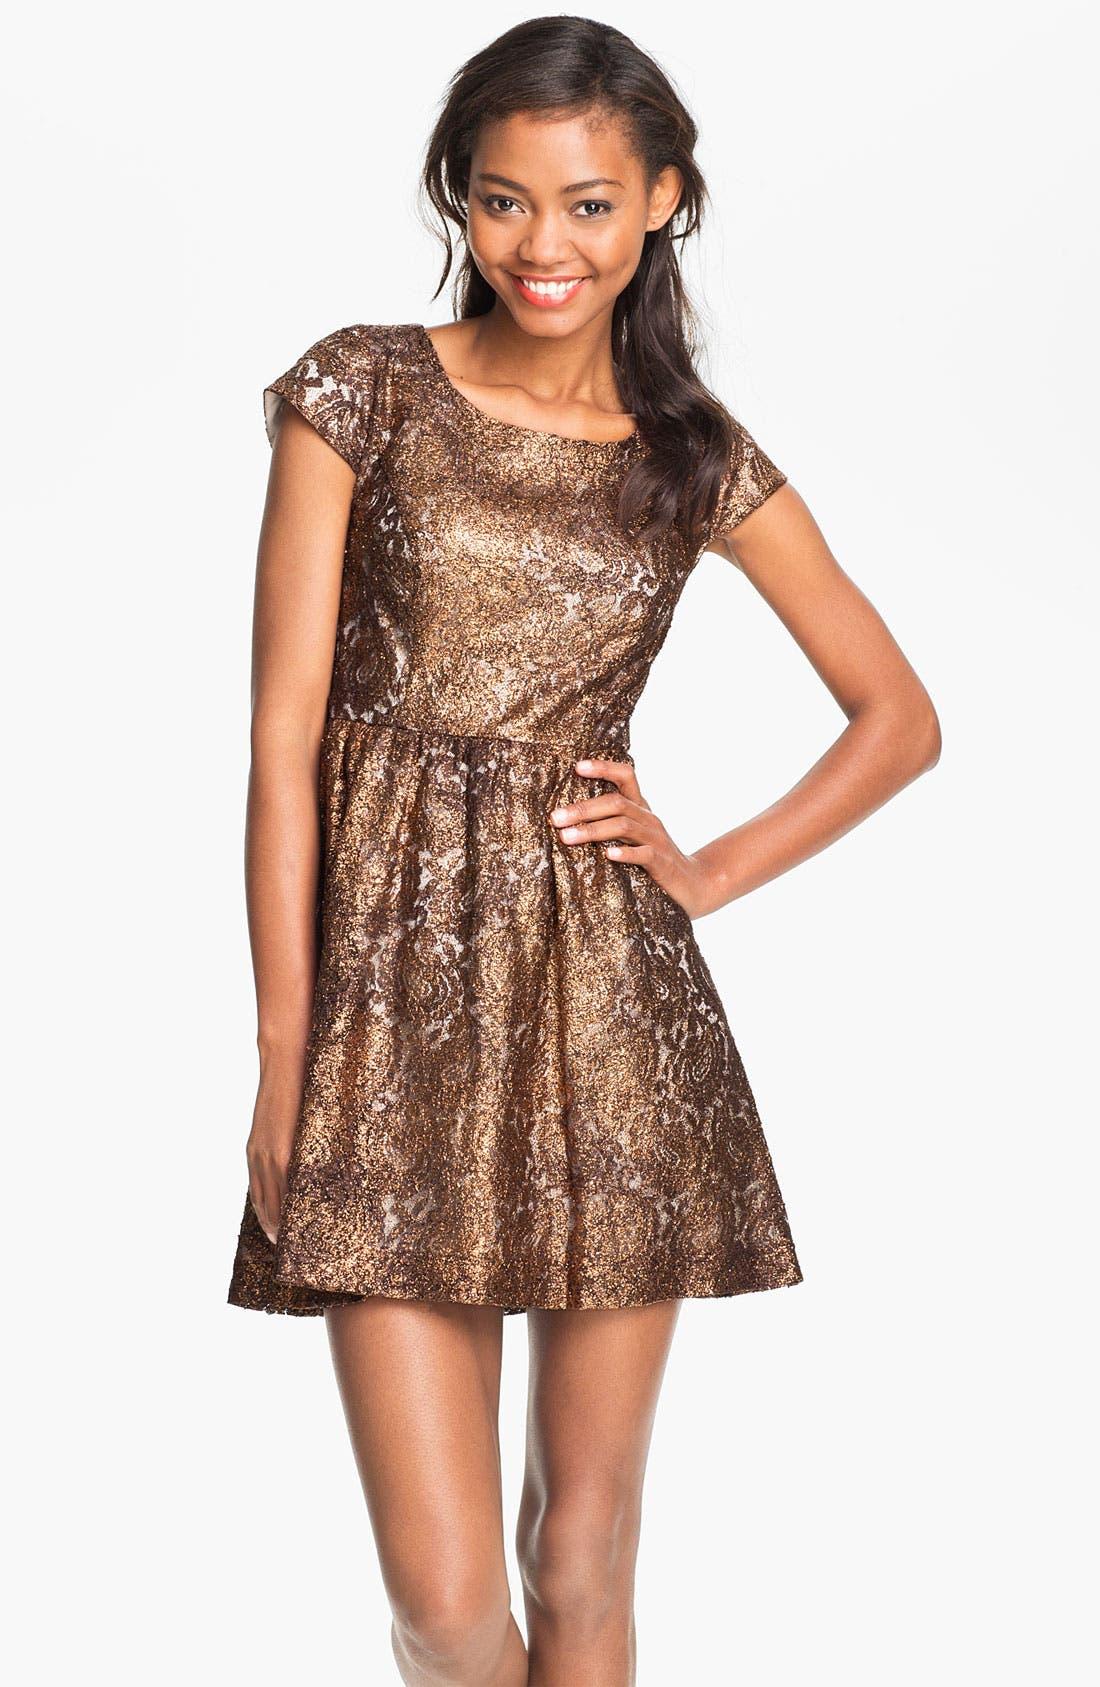 Alternate Image 1 Selected - Kensie Foil Lace Dress (Online Exclusive)